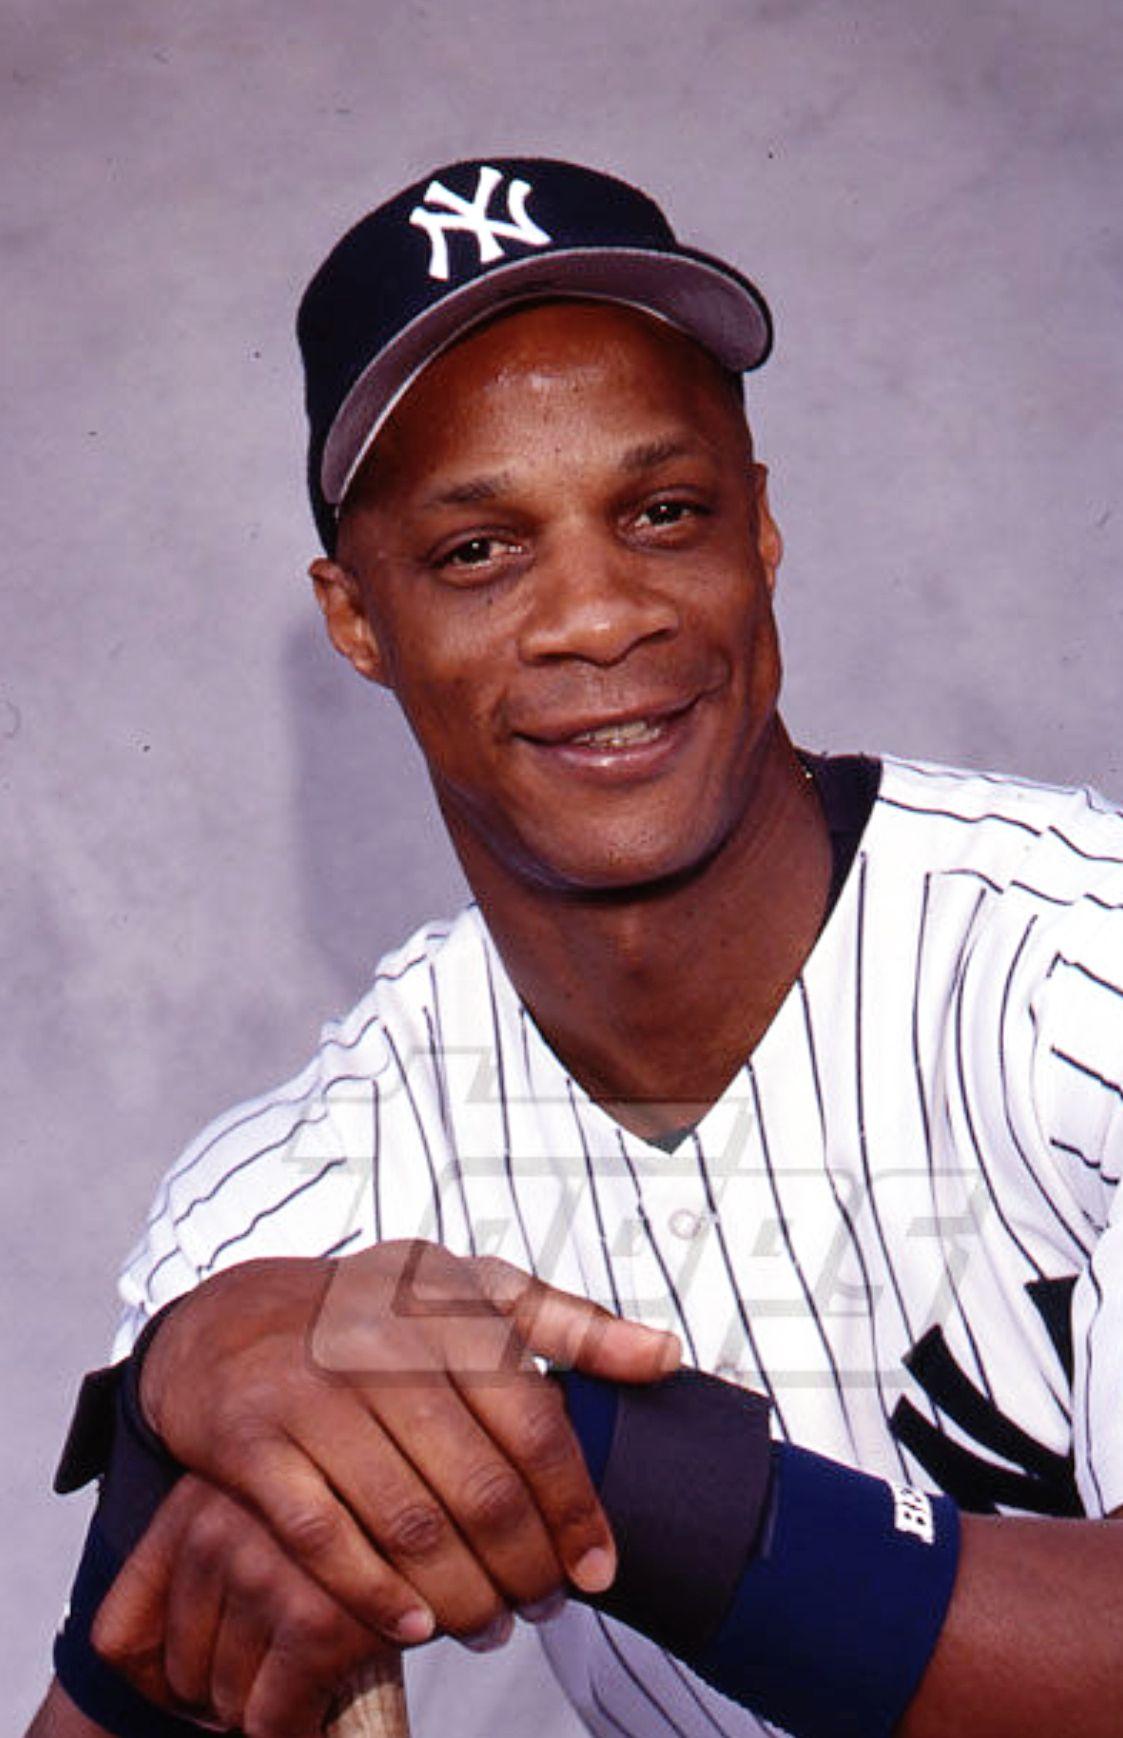 Darryl Strawberry Always Intimidating At The Batter S Box 3 3 3 Yankees Baseball Players New York Yankees Baseball Yankees Baseball